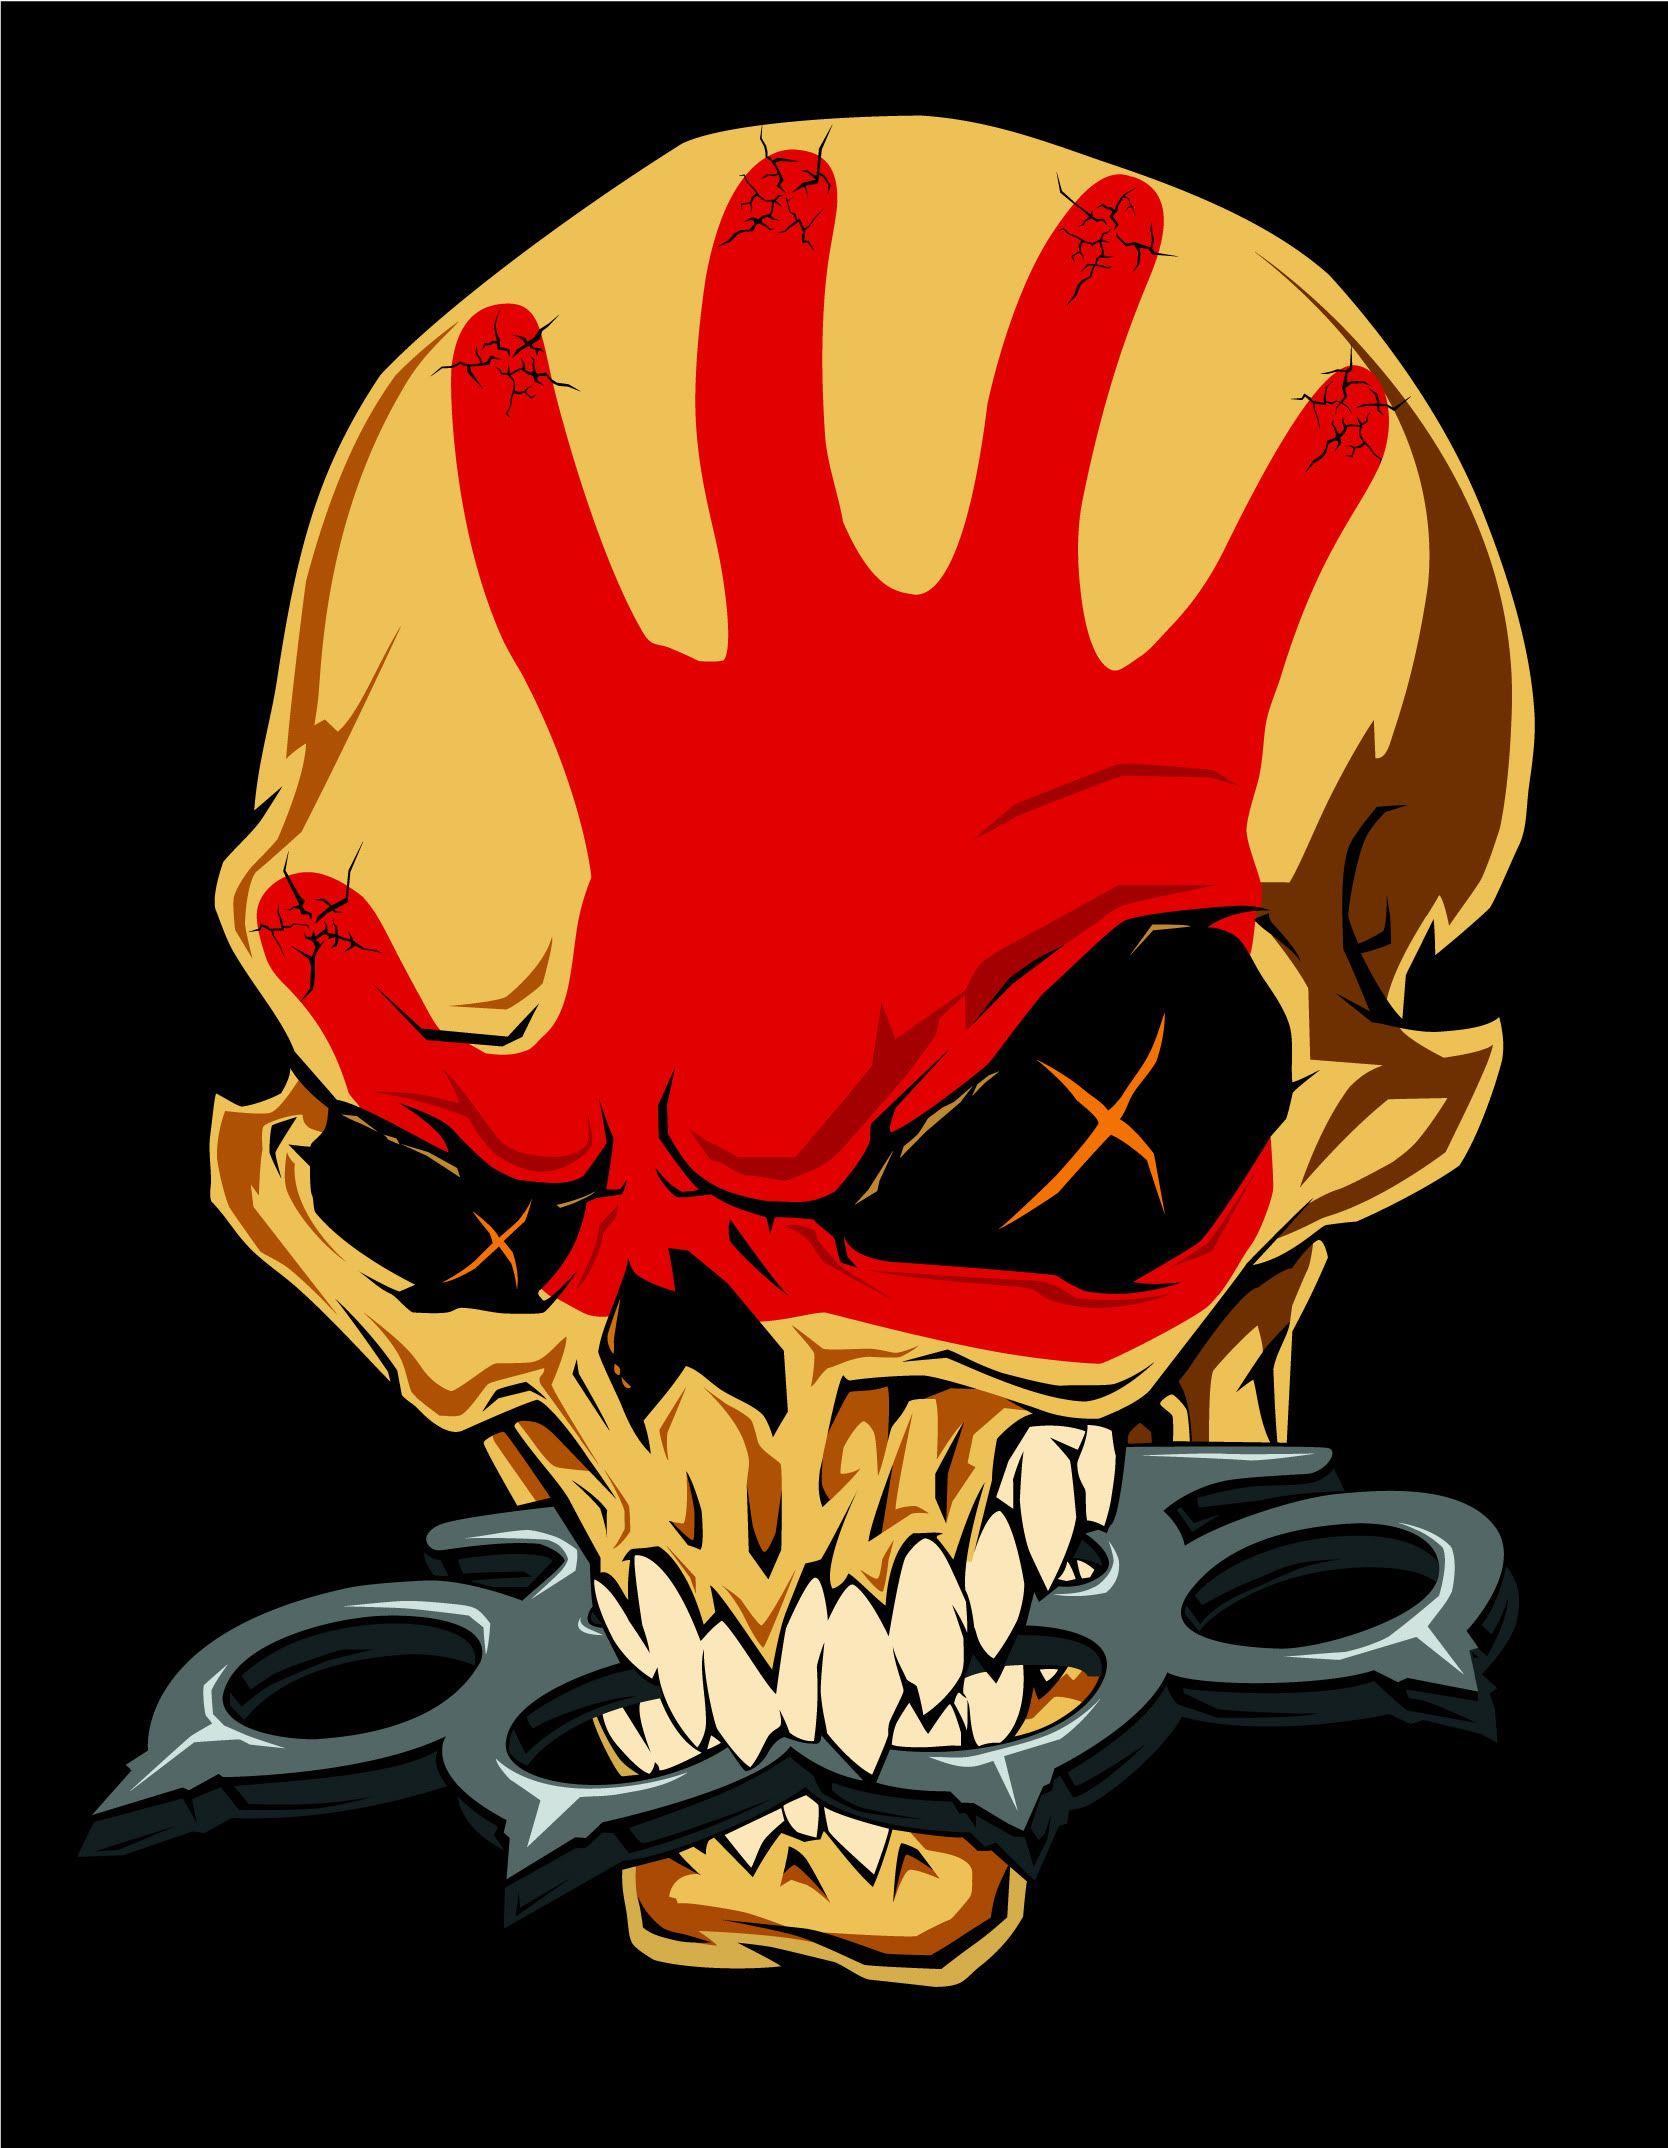 Las vegas tattoo pictures images photos photobucket - 5fdp Skull Http S695 Photobucket Com Profile